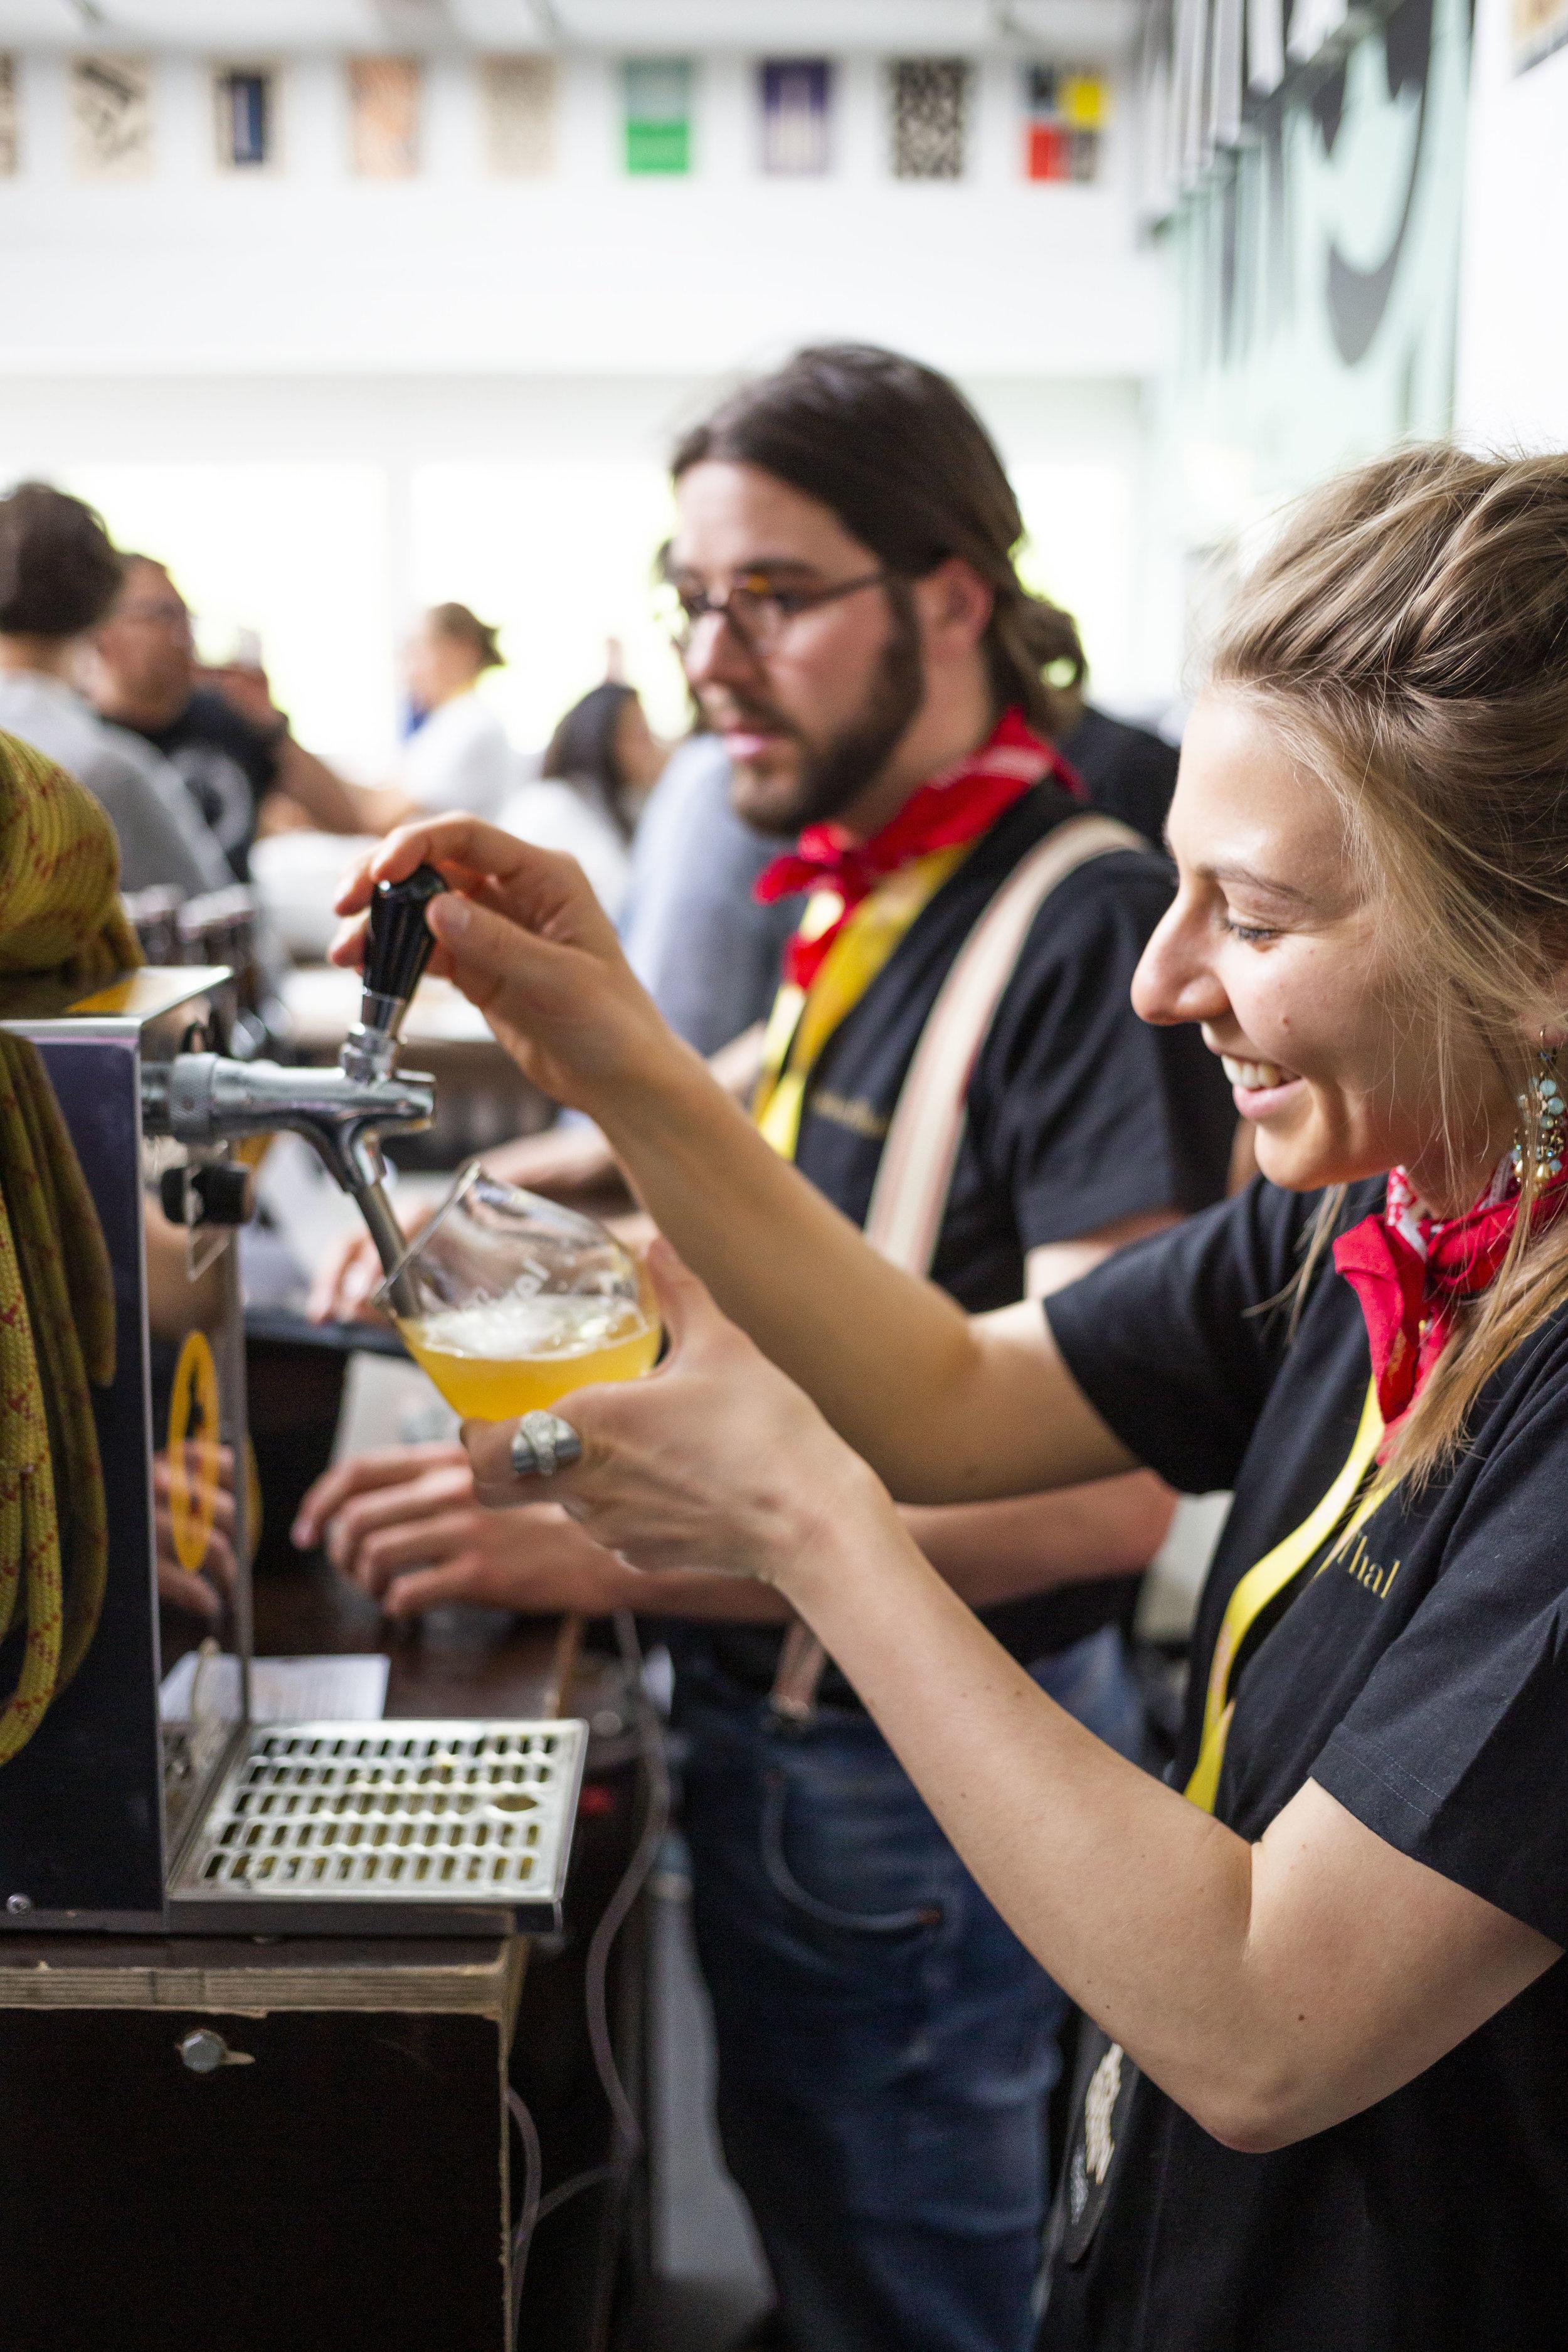 BierfestivalLuzern-4.jpg